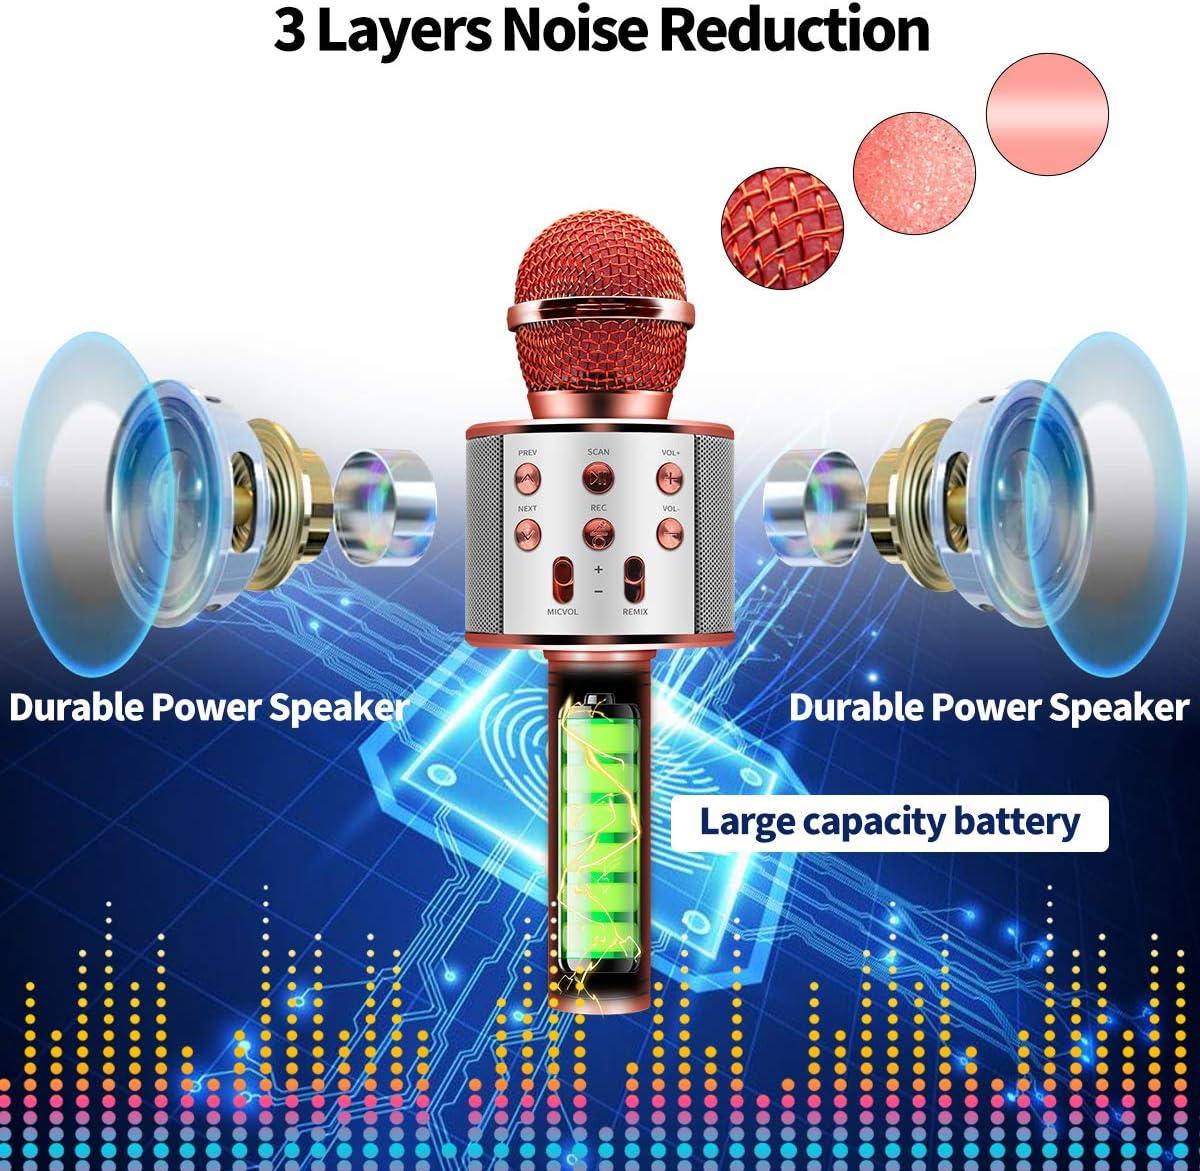 Wireless Karaoke Bluetooth Microphone Compatible with Smart Phone Durable HIFI Speaker Kids Microphone Karaoke Microphone for Home Party Player Karaoke Machine with Record Function